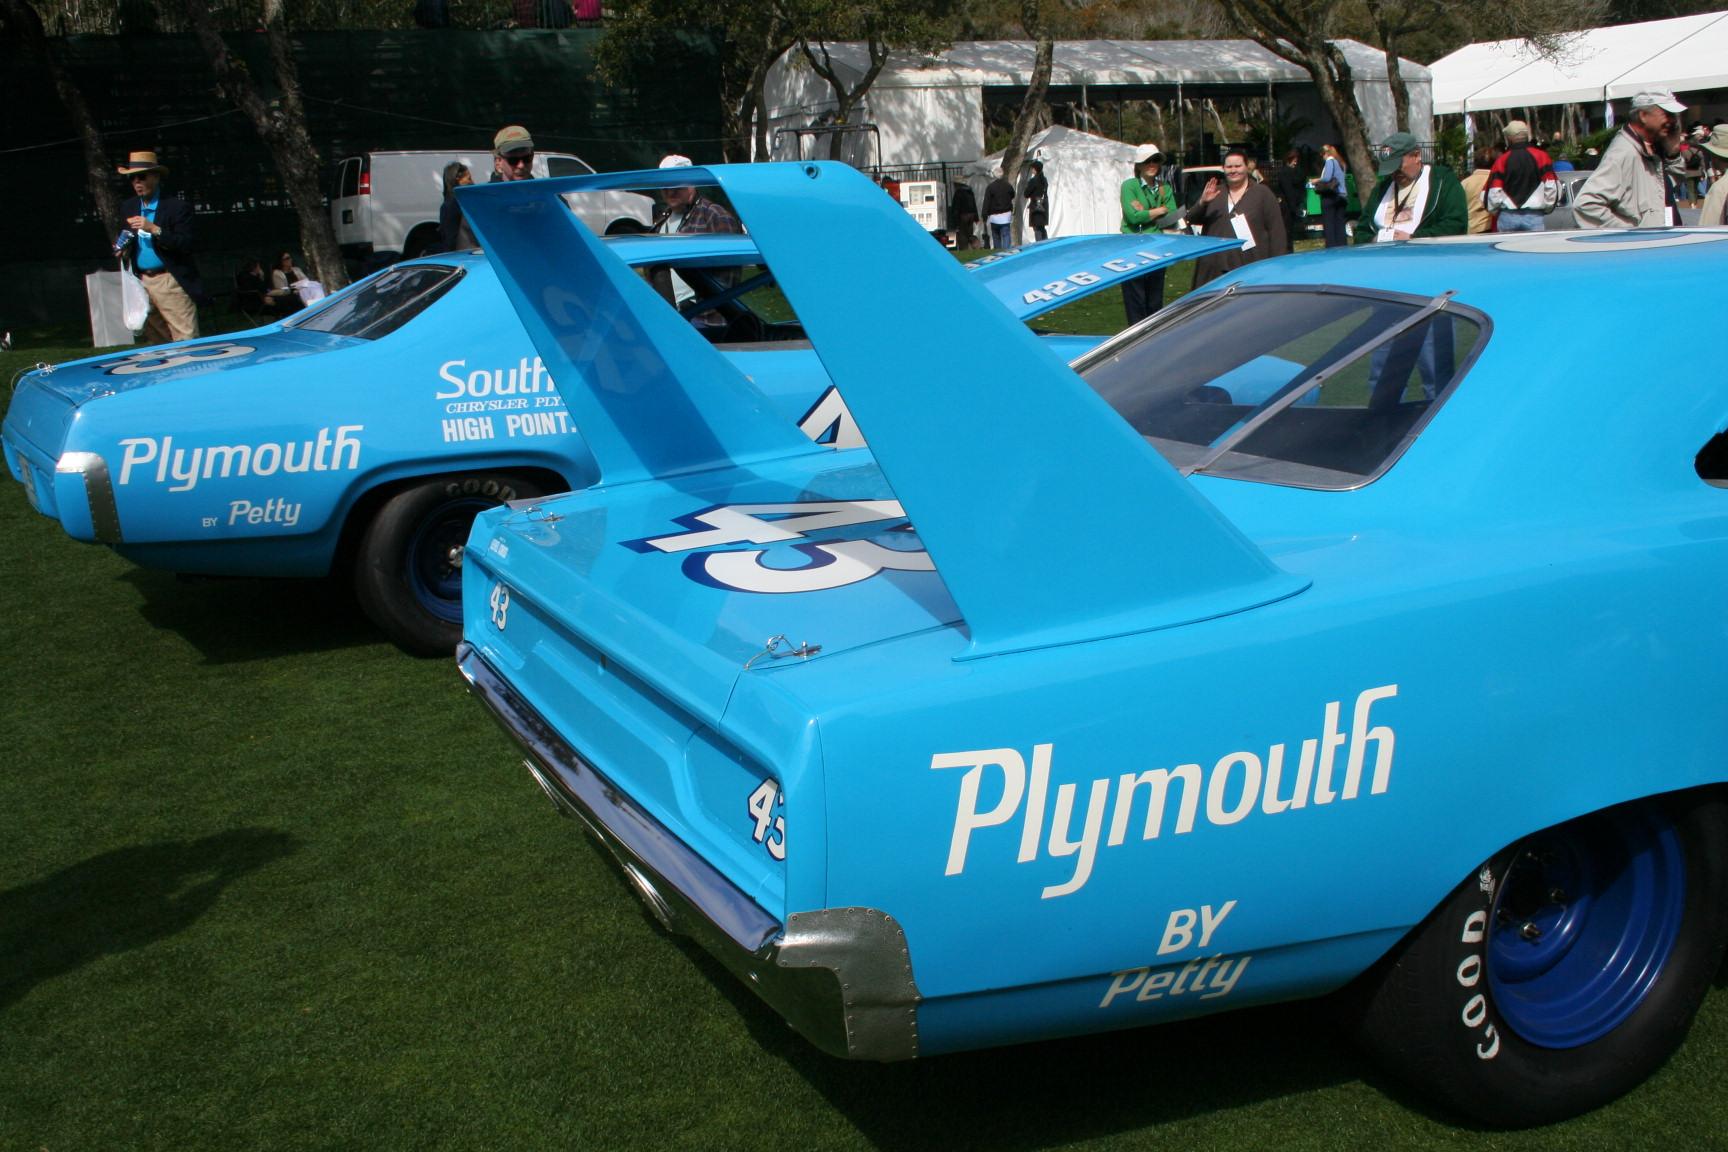 Racing Legends Richard Petty Ultimate Hot Wheels